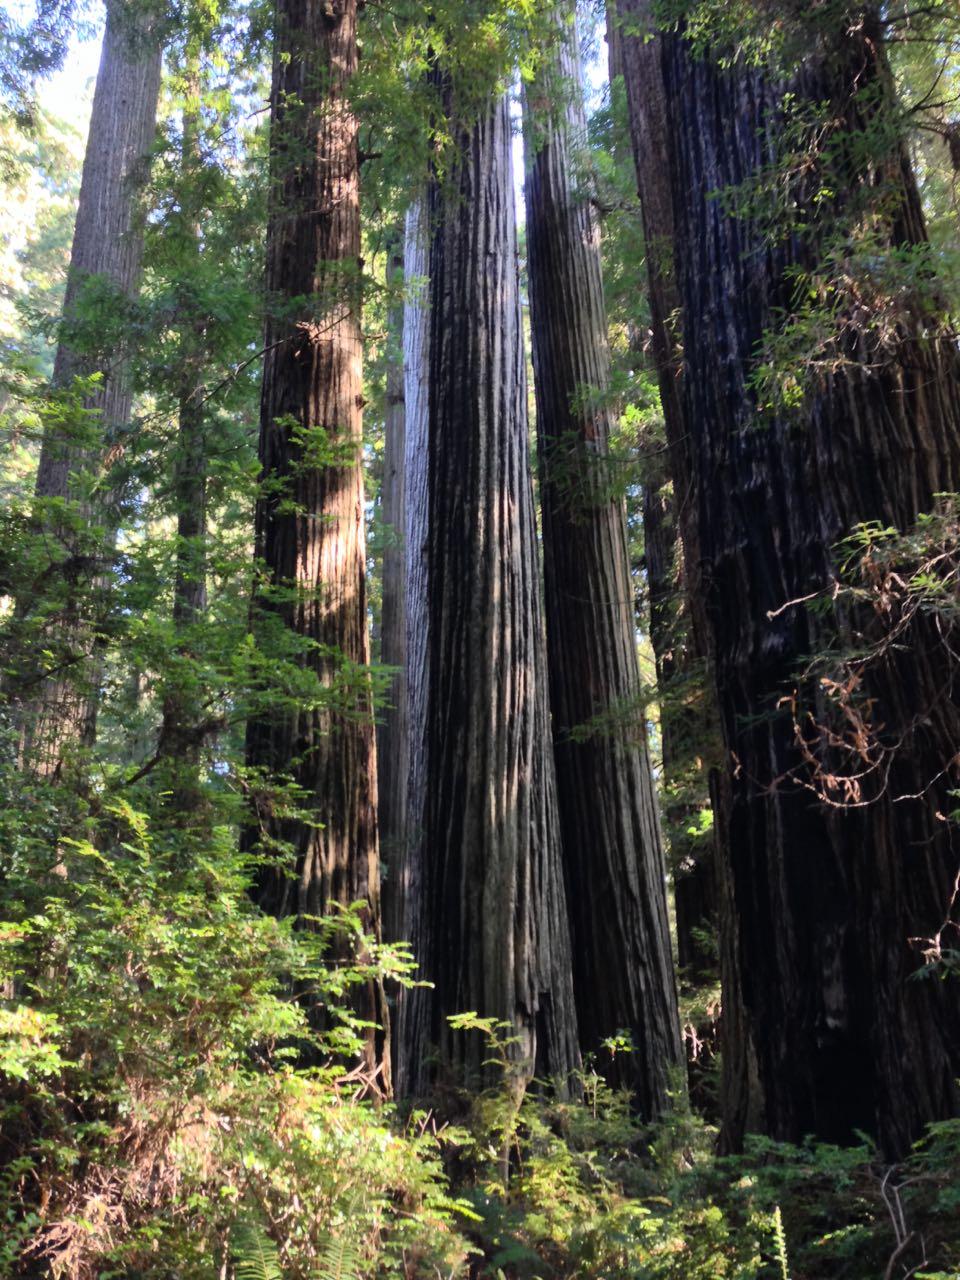 Redwoods 2017 10 01 158 Of 244